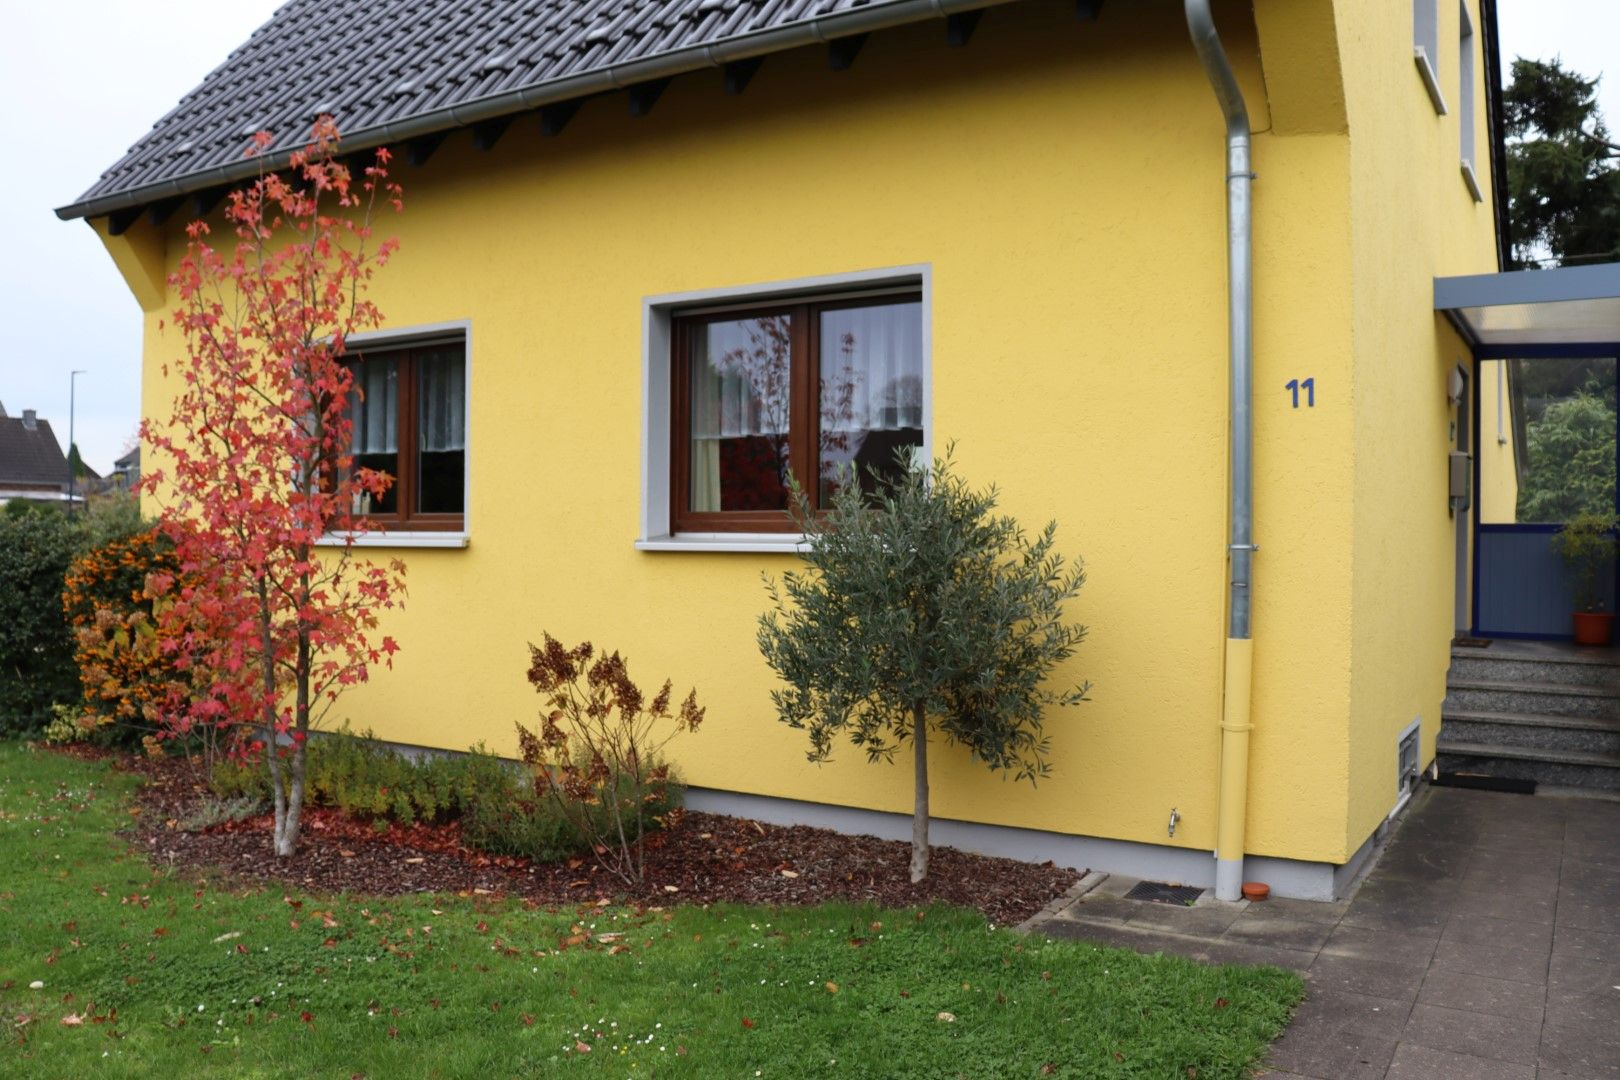 Immobilie Nr.0281 | Mittelstraße 11, 40668 Meerbusch - Lank